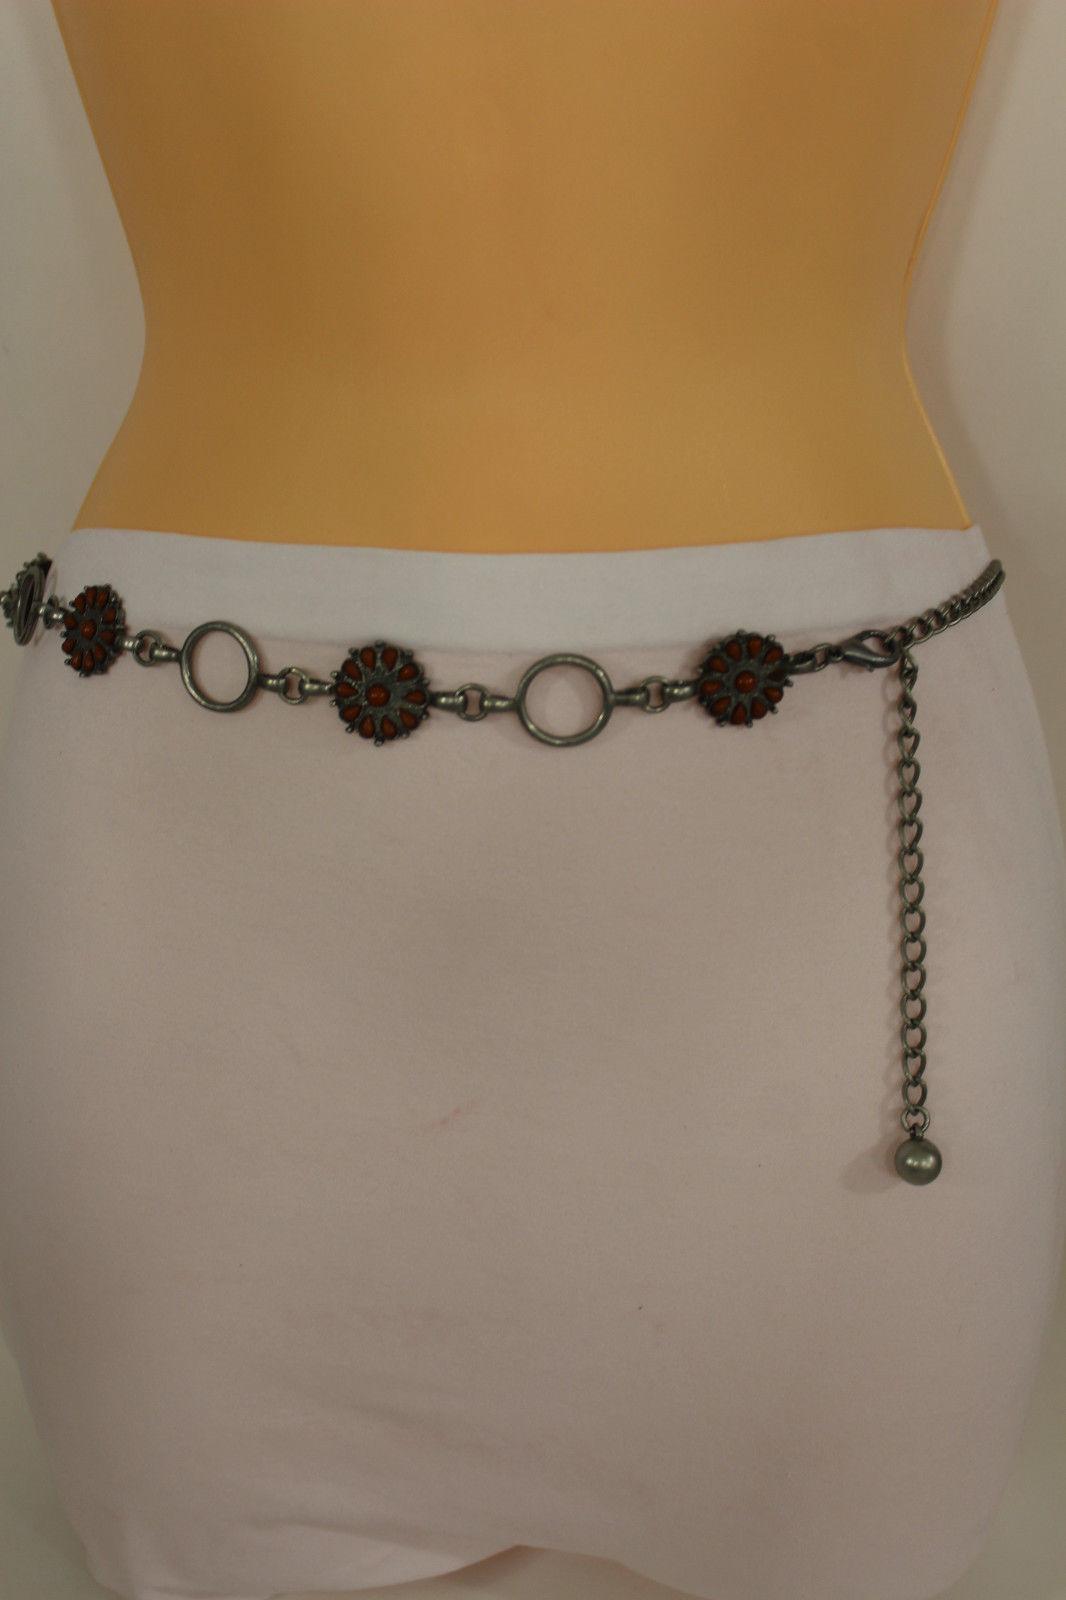 New Women Antique Silver Belt Brown Red Beige Beads Metal Chains Hip Waist S M L